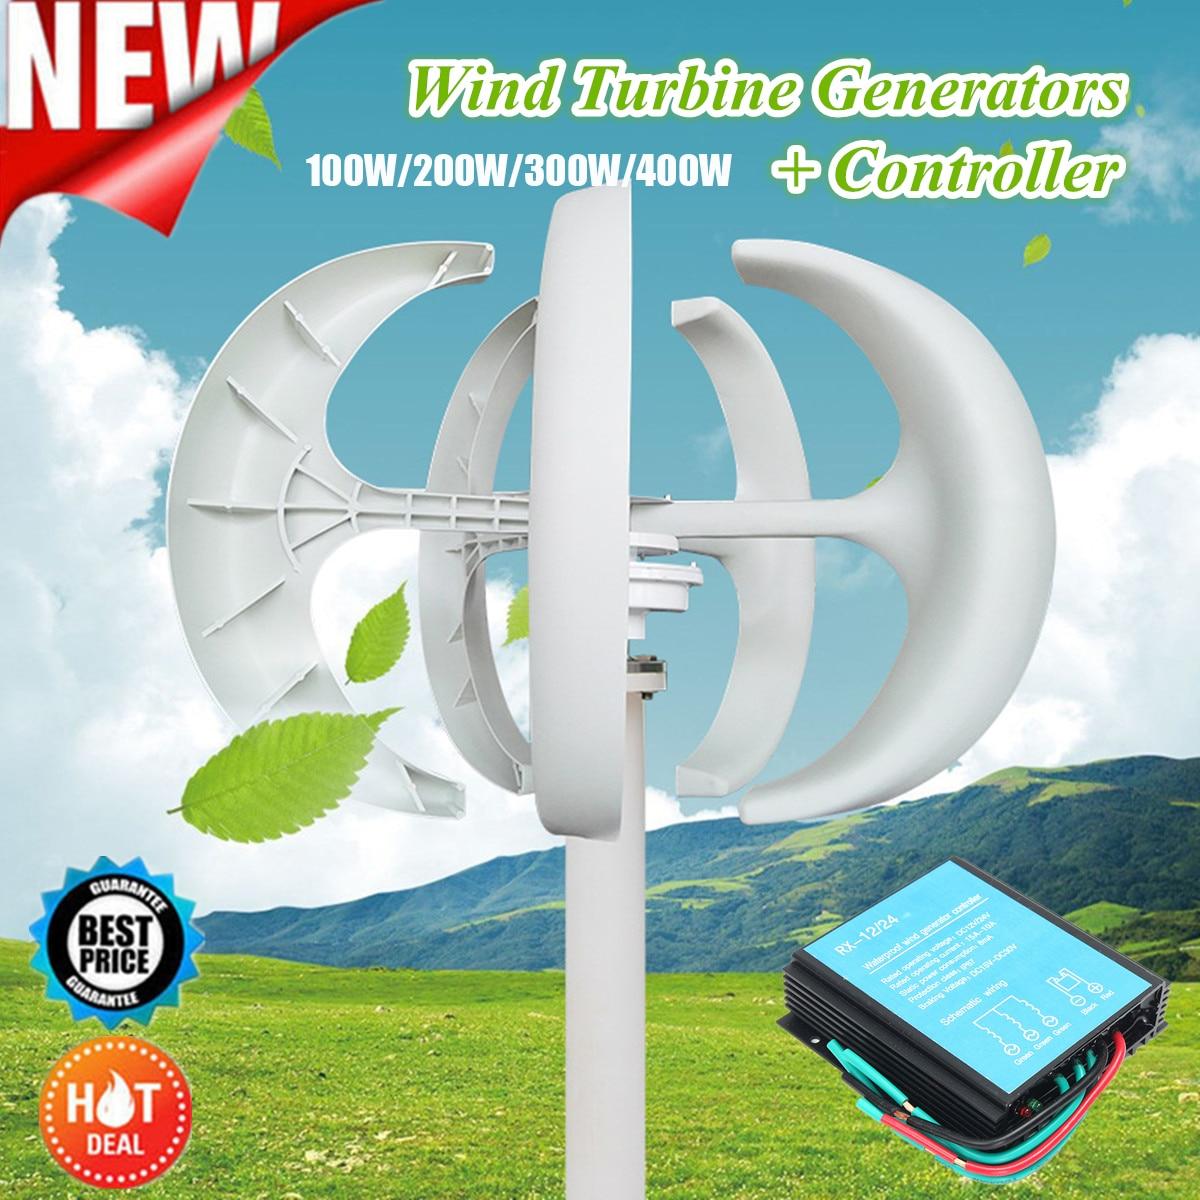 100W/200W/300W/400W Wind Generator Lantern 12V 24V 5 Blades Permanent Magnet Generator Turbine + 600W Wind Controller 100w 200w 300w 400w lantern wind turbine generator dc 12v 24v wind power permanent magnet generator 600w wind energy controller